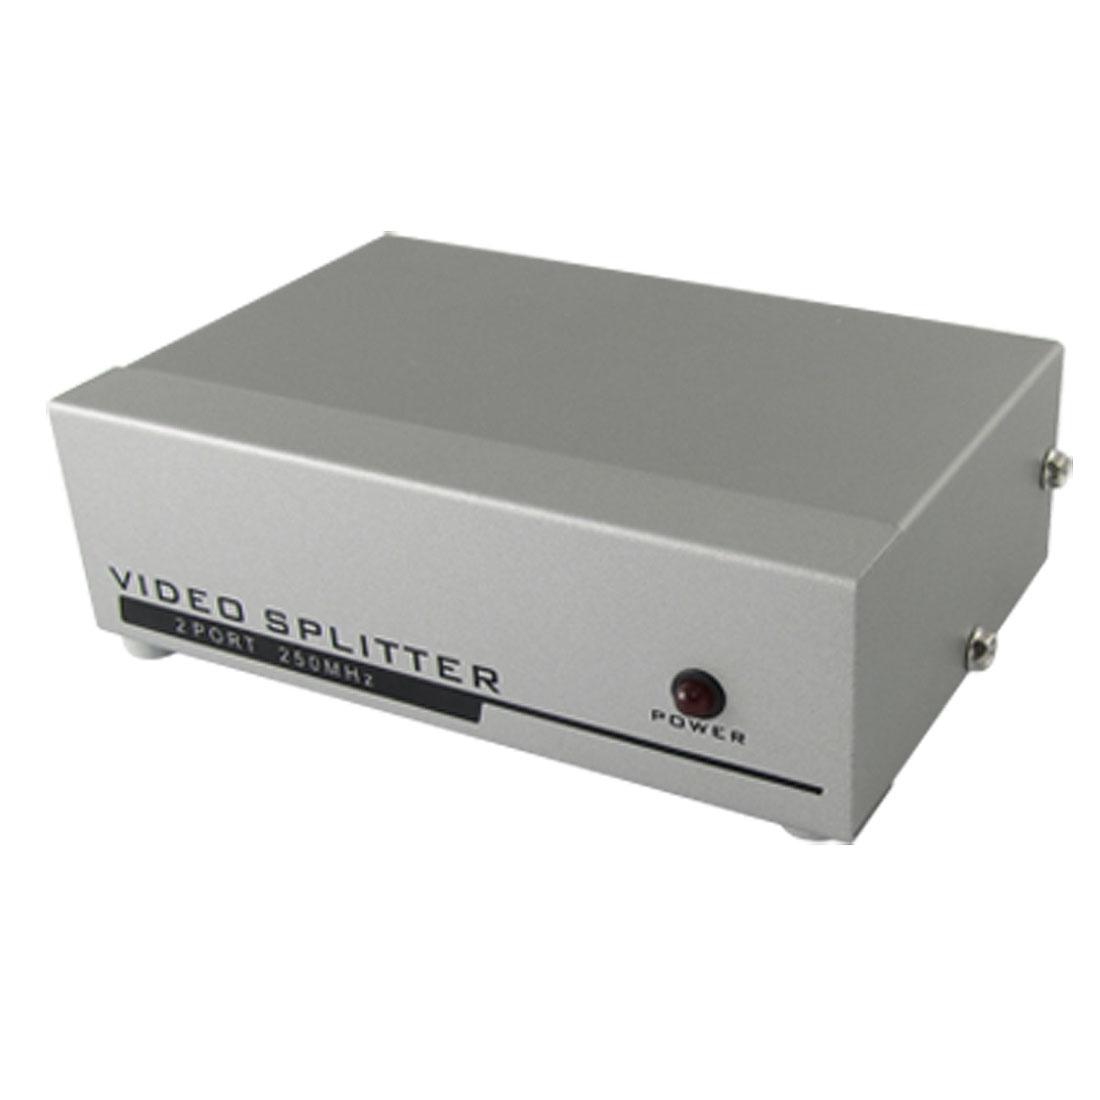 EU Plug 9VDC 1 PC to 2 Port VGA SVGA Monitor Video Splitter 250MHz